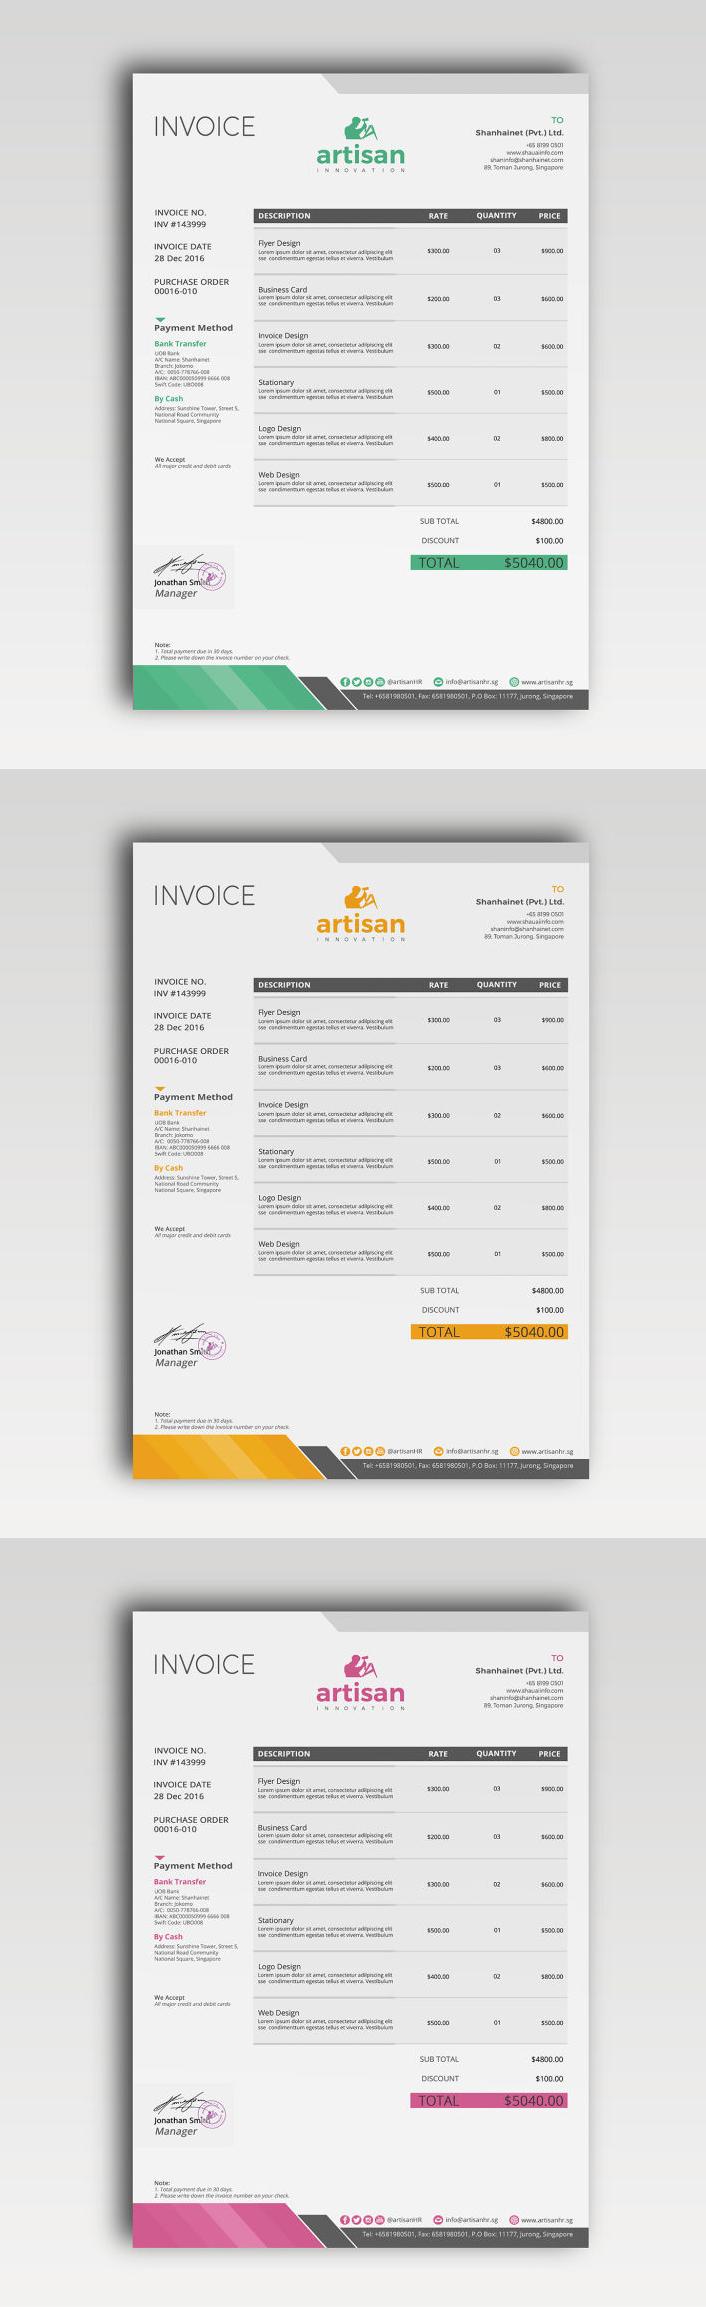 Invoice Template PSD AI EPS XLSX DOCX DOC Proposal - Invoice template psd